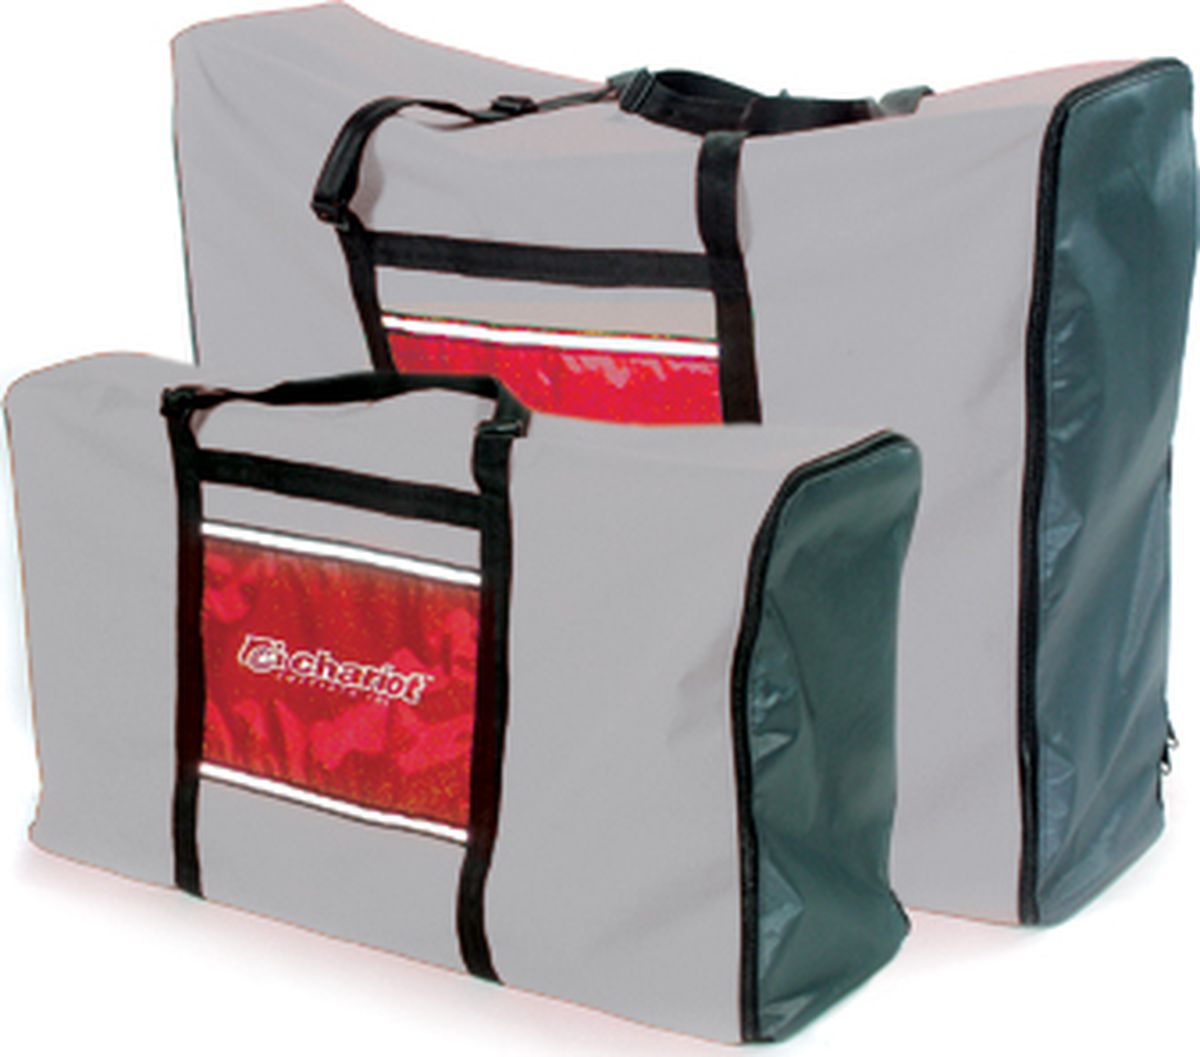 Thule Транспортная сумка на колесиках Chariot 1